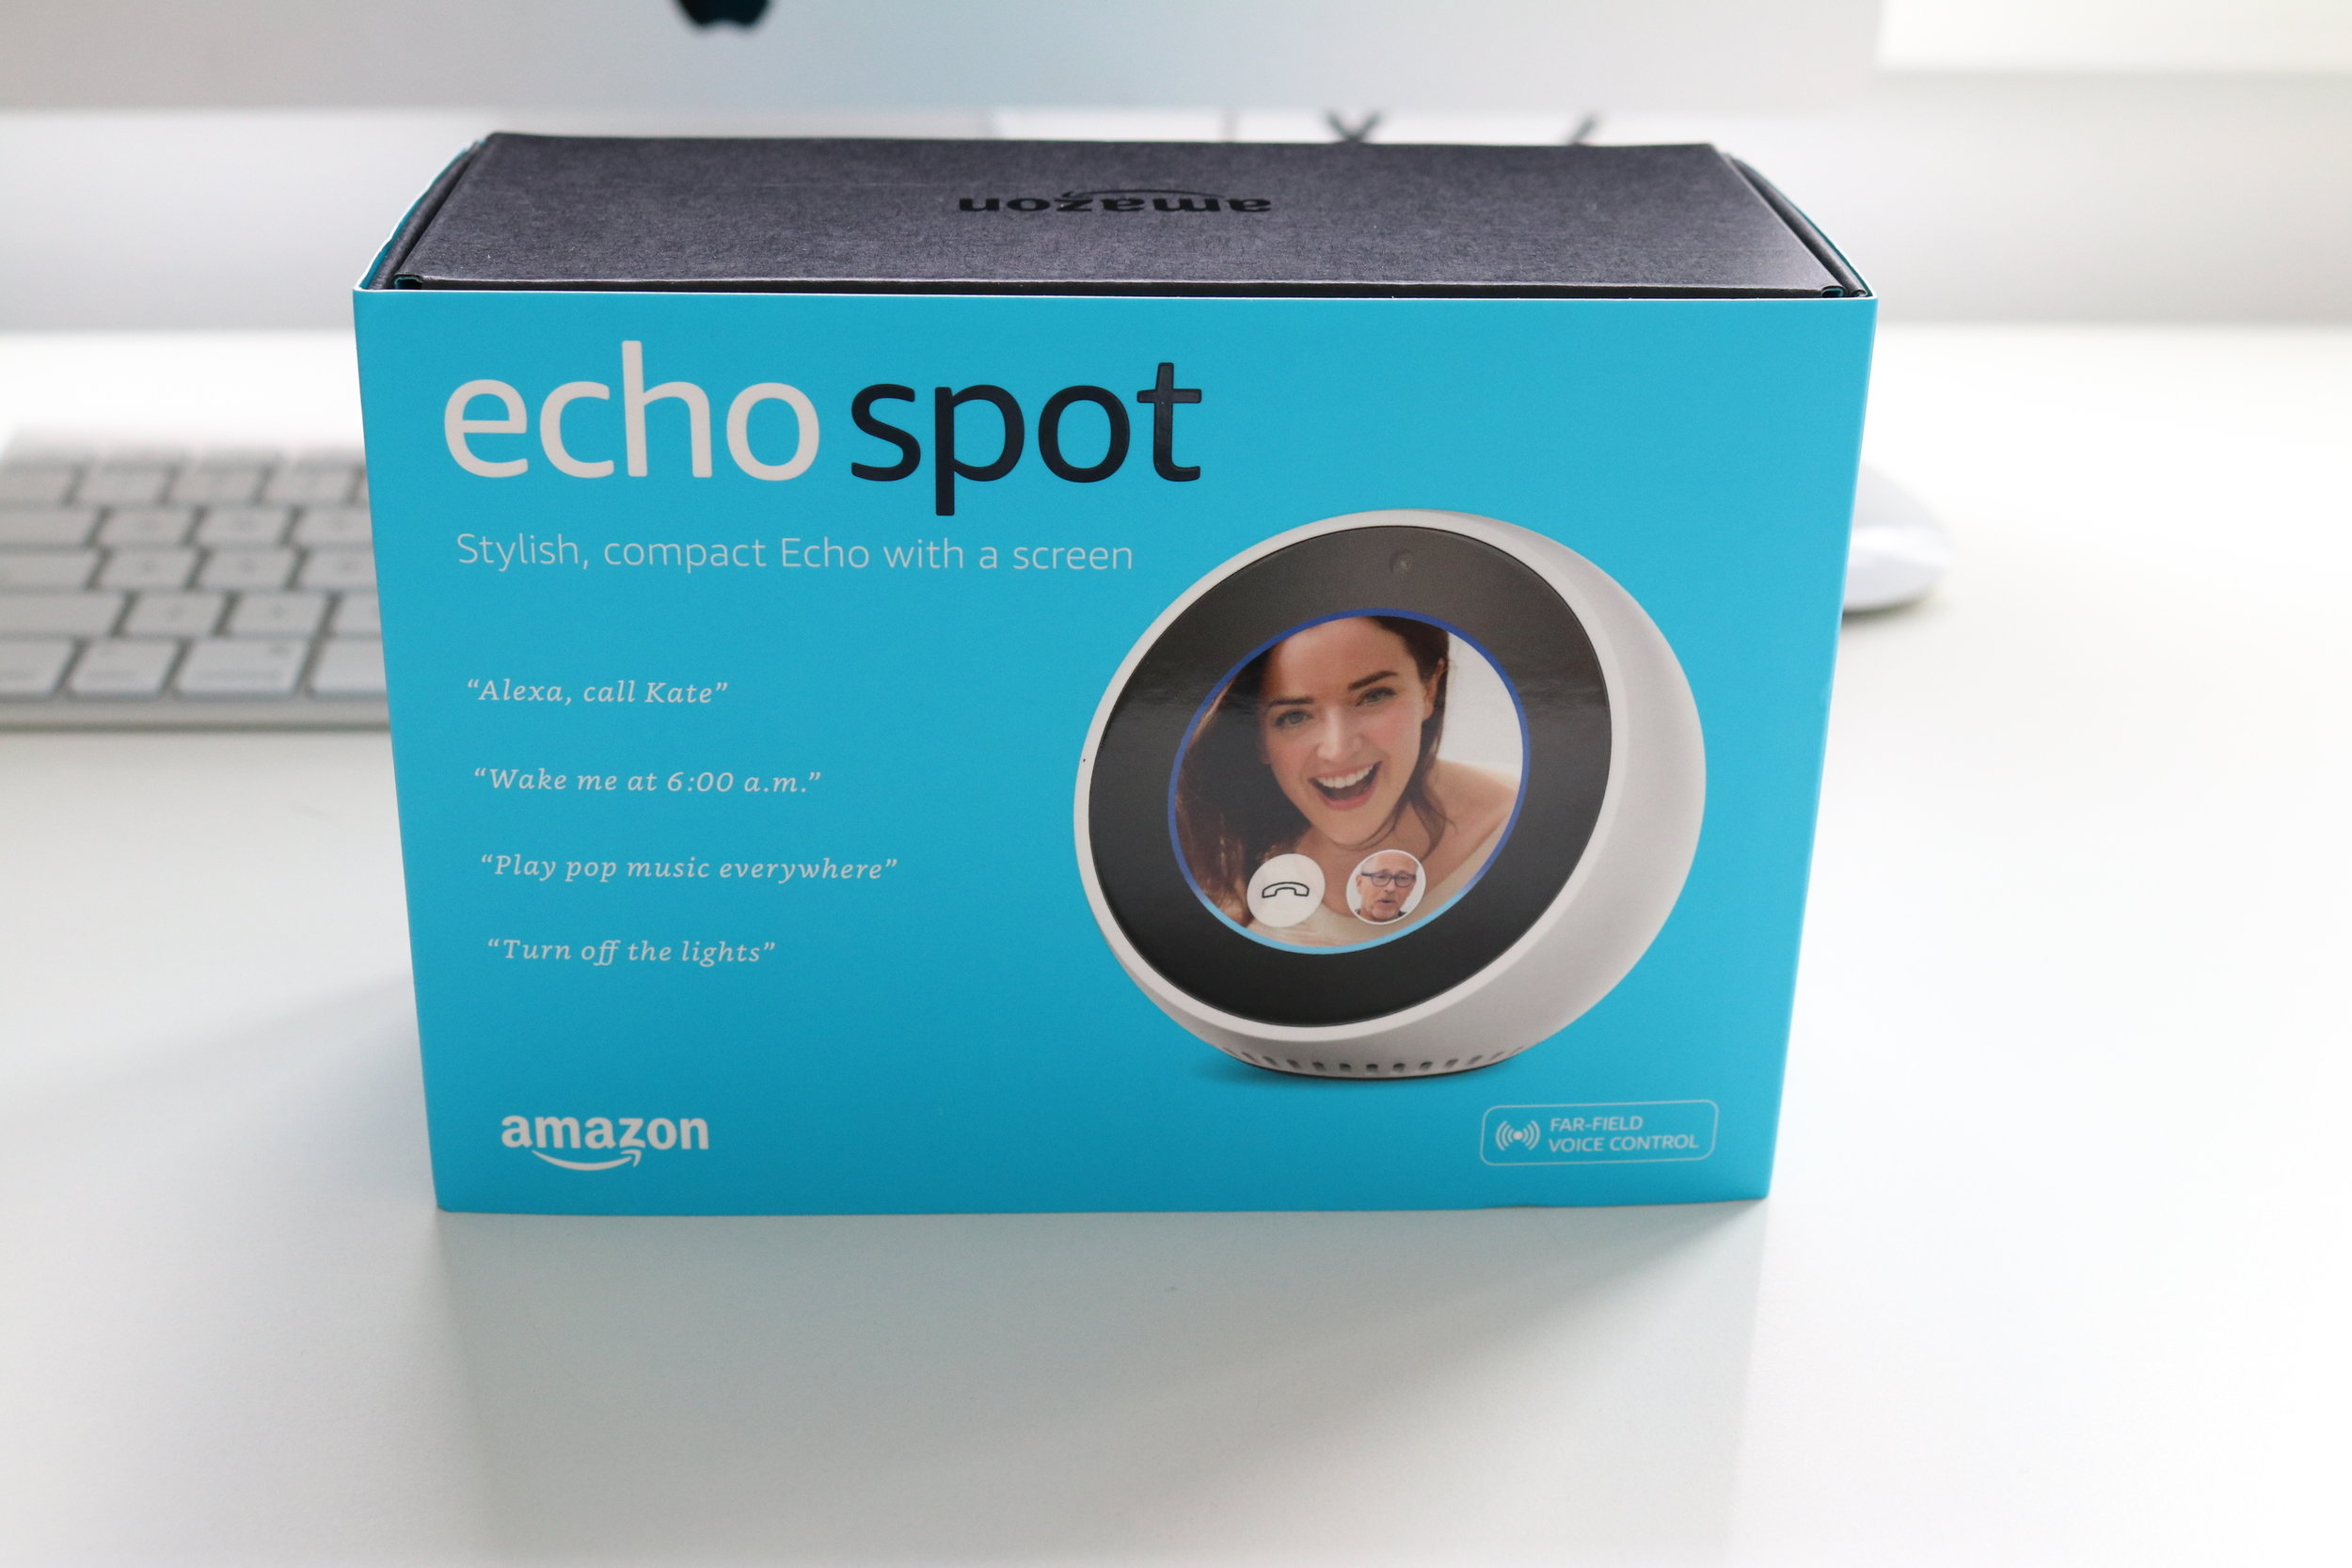 Amazon Alexa App Compatible  Amazon Echo Spot - Alexa With A Screen